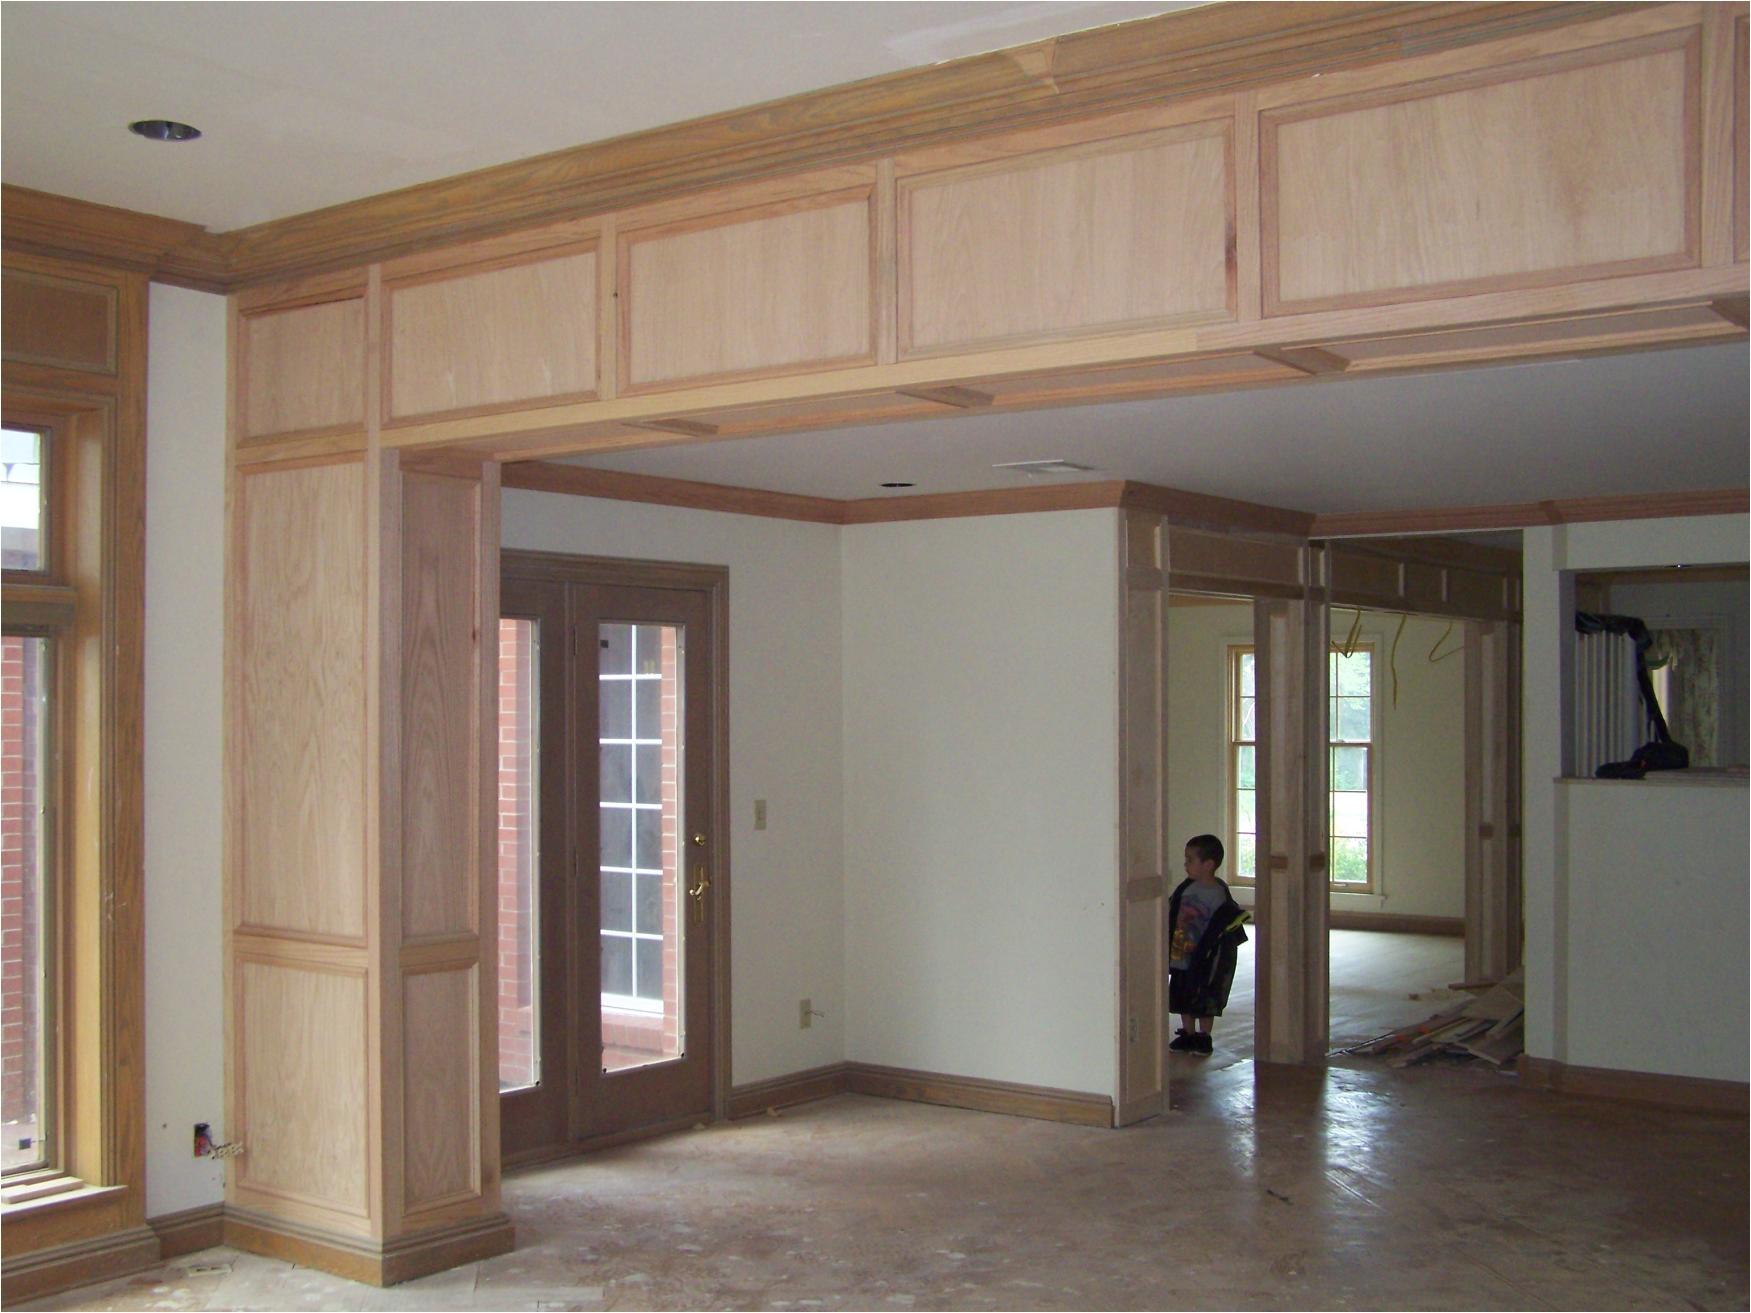 finishing basement support columns pics would be great 019 2 jpg